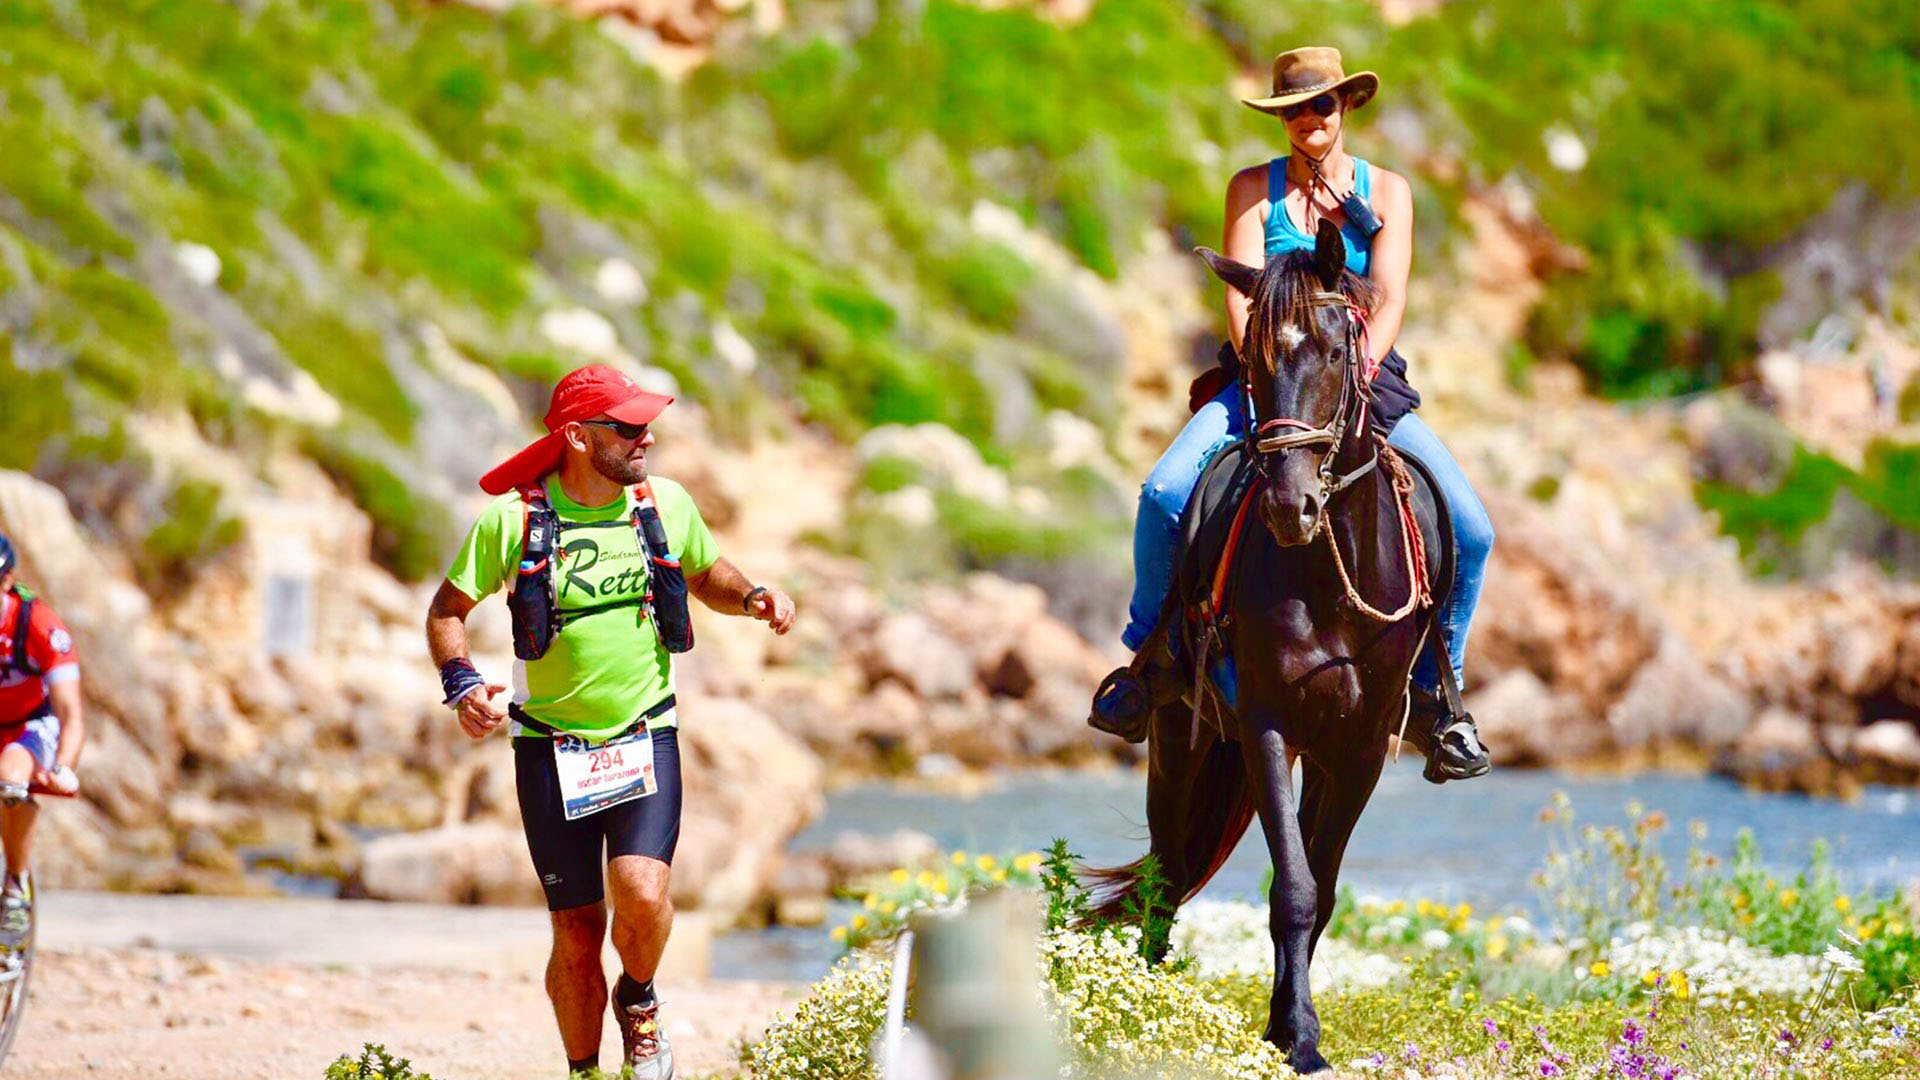 Imagen Esdeveniment Camí de Cavalls Epic 360